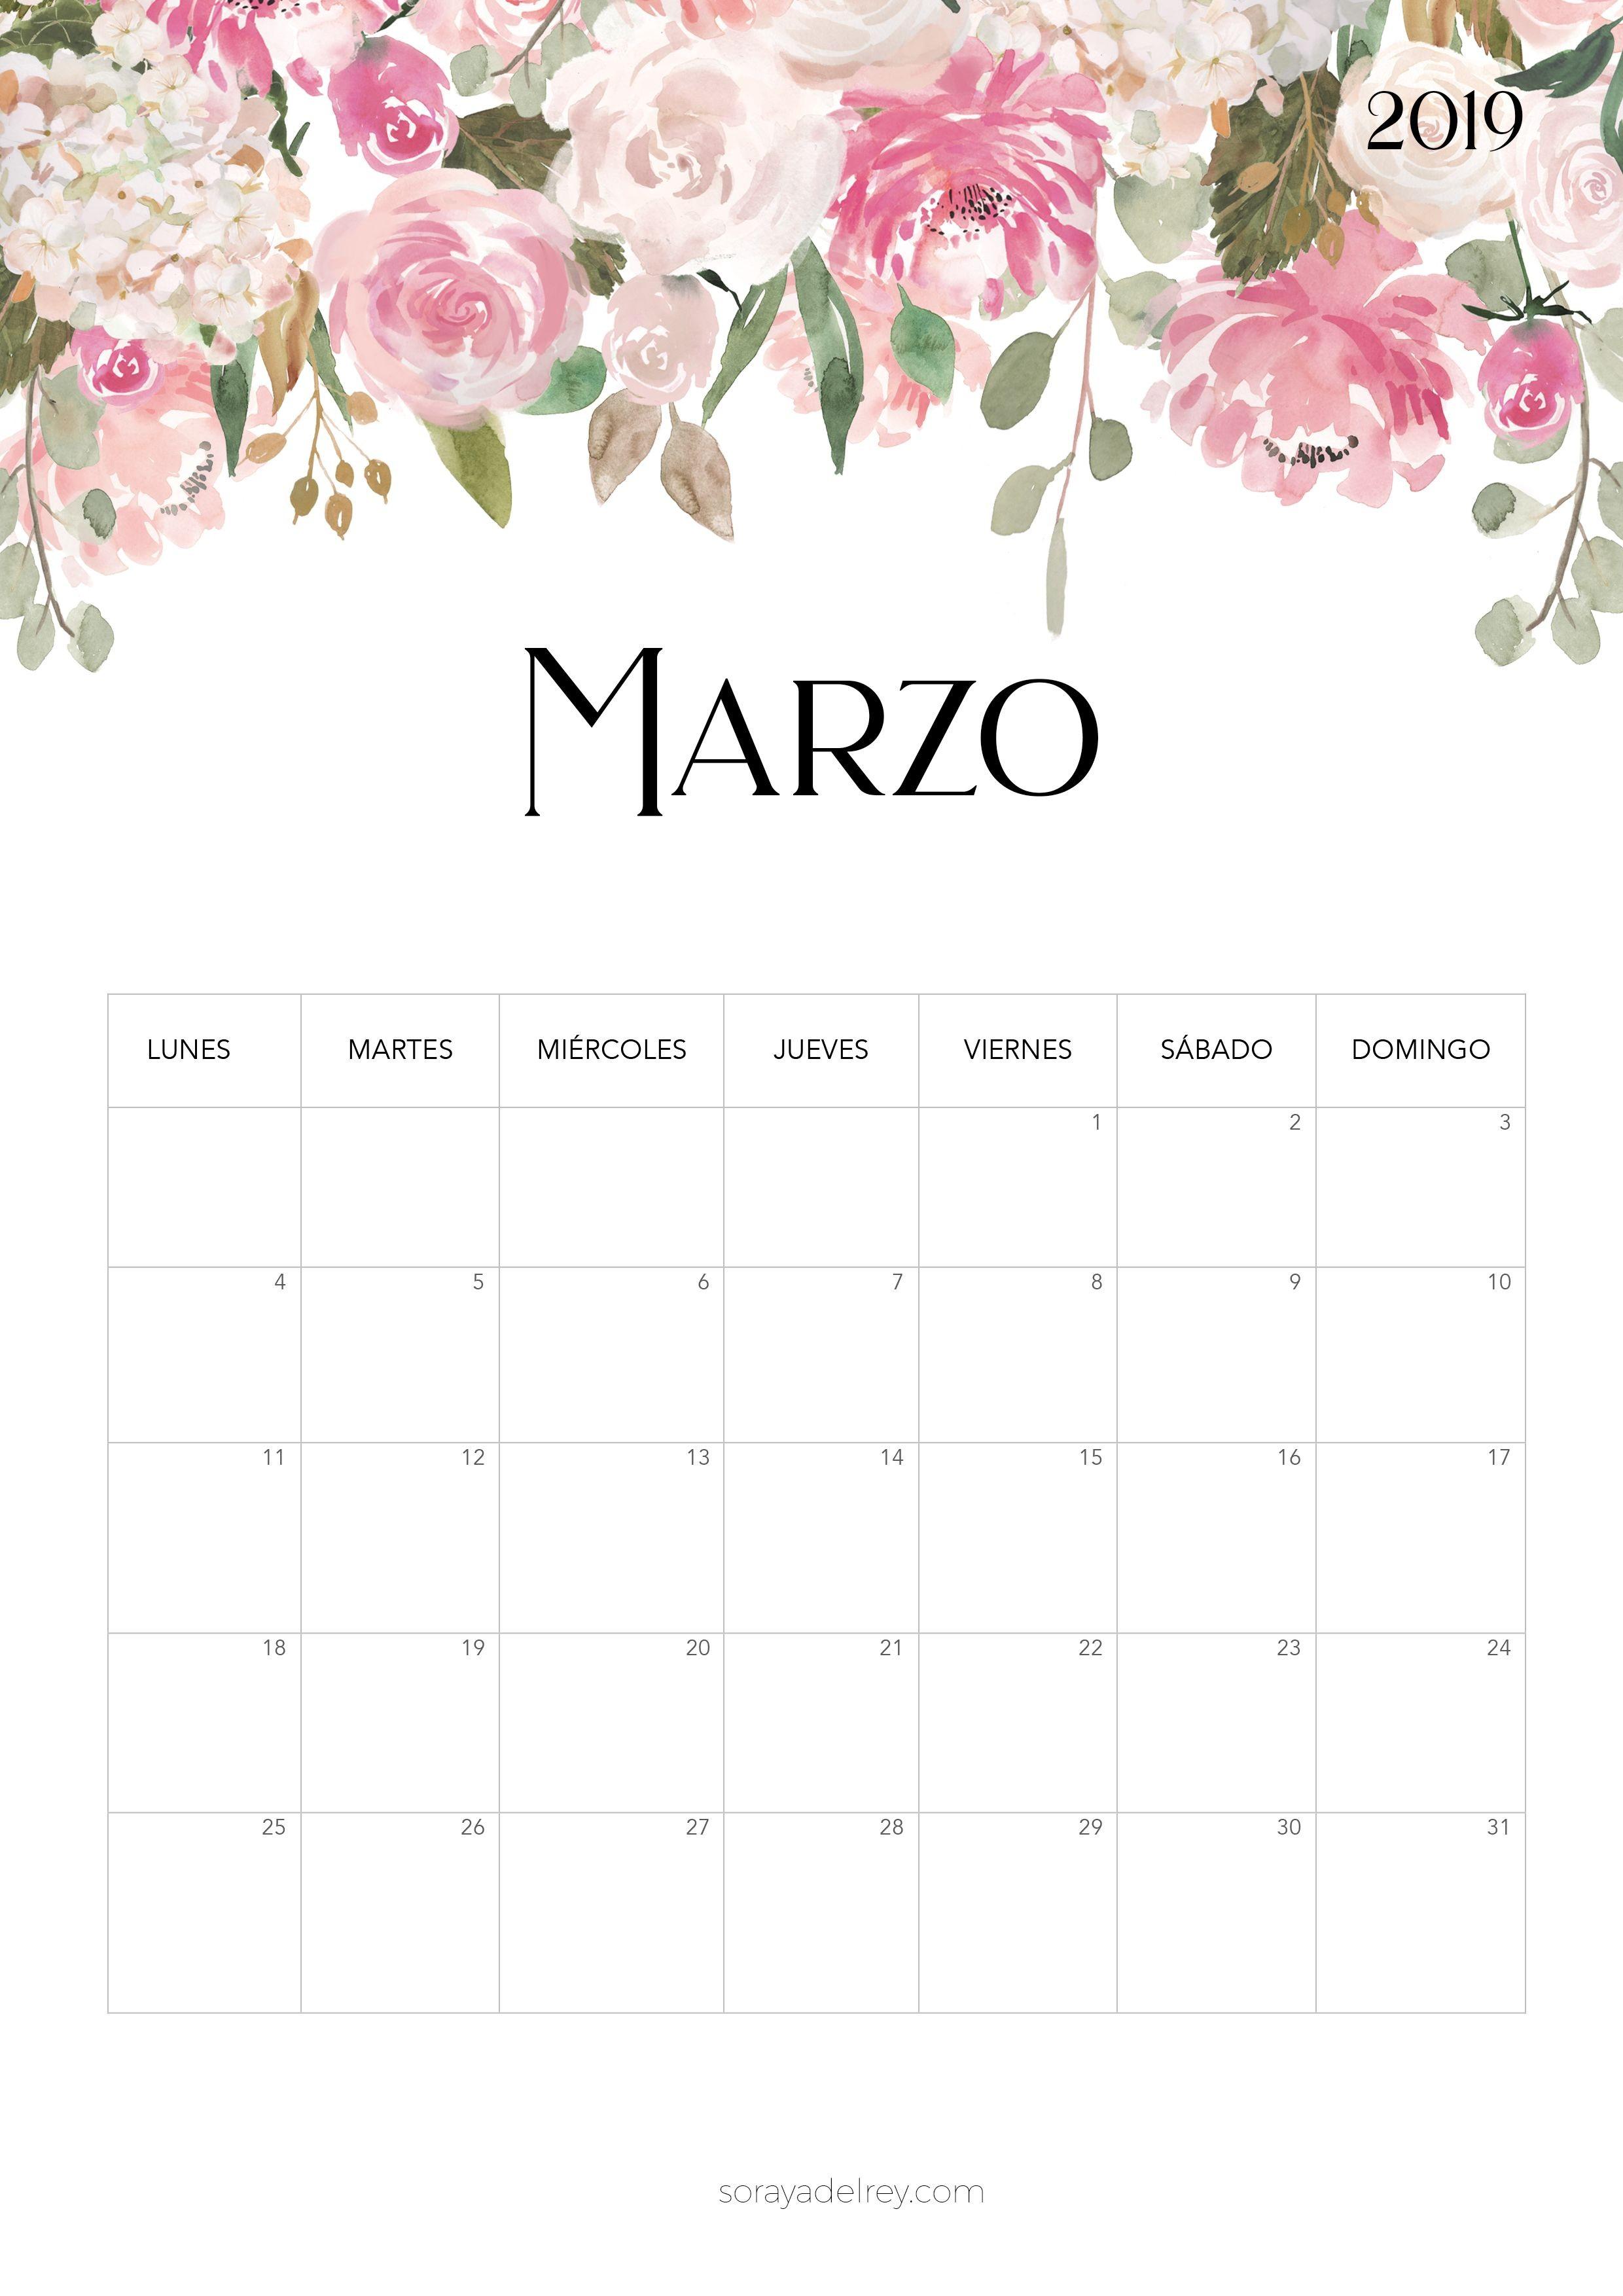 Calendario 2017 Imprimir Anual Más Caliente Calendario Para Imprimir 2018 2019 Costurero